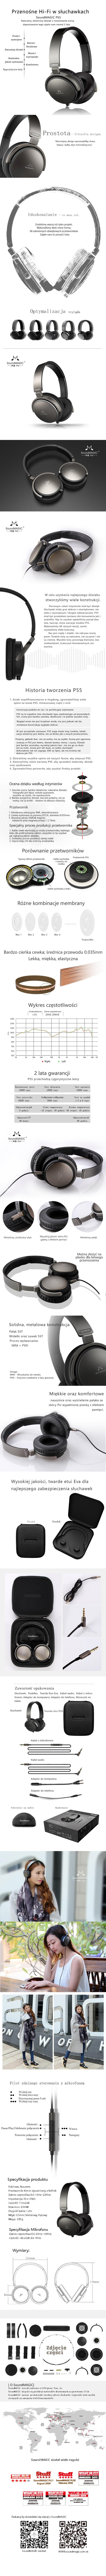 P55 Vento SoundMAGIC